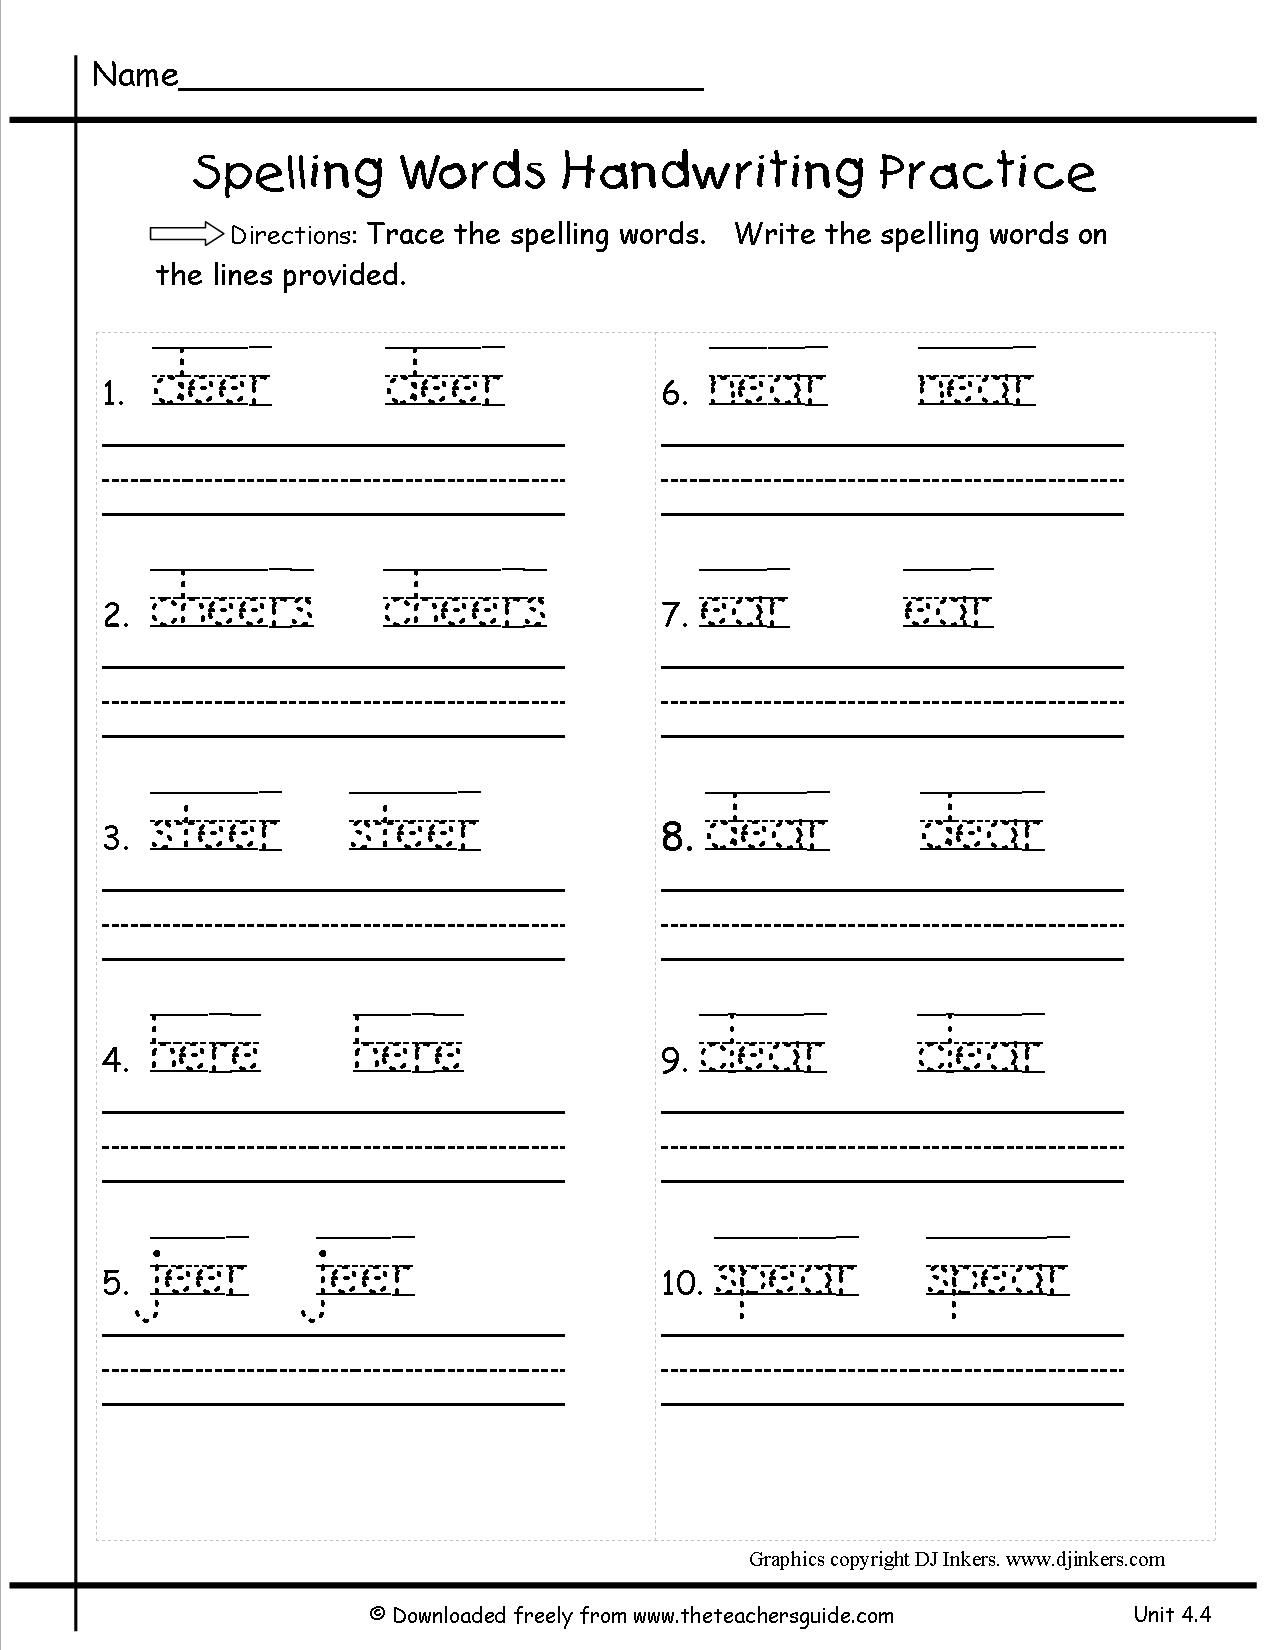 1St Grade Spelling Worksheets For Download Free - Math